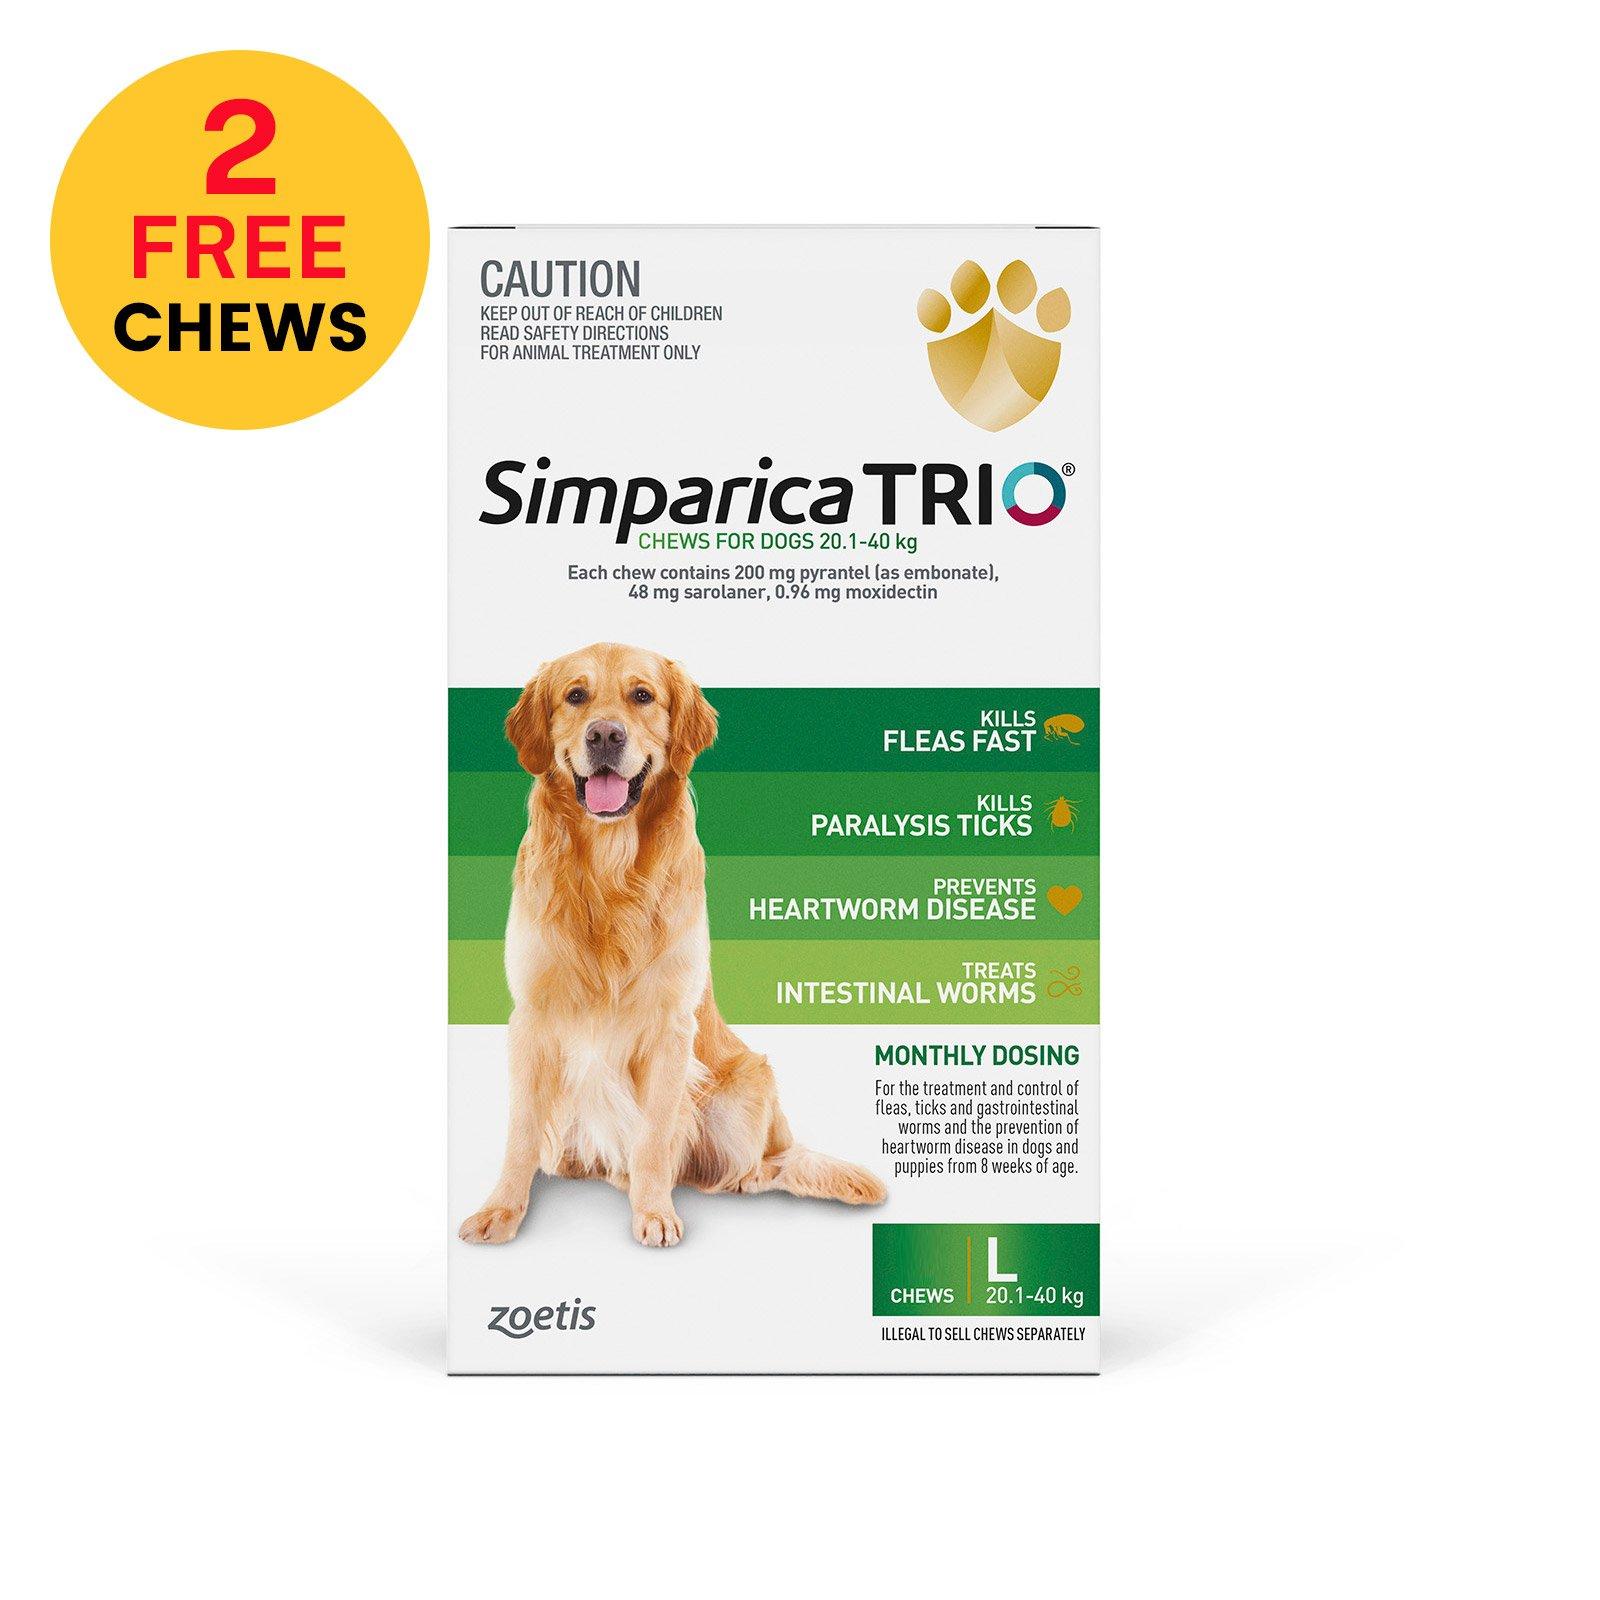 Simparica TRIO for Large Dogs 20.1-40kg (Green)